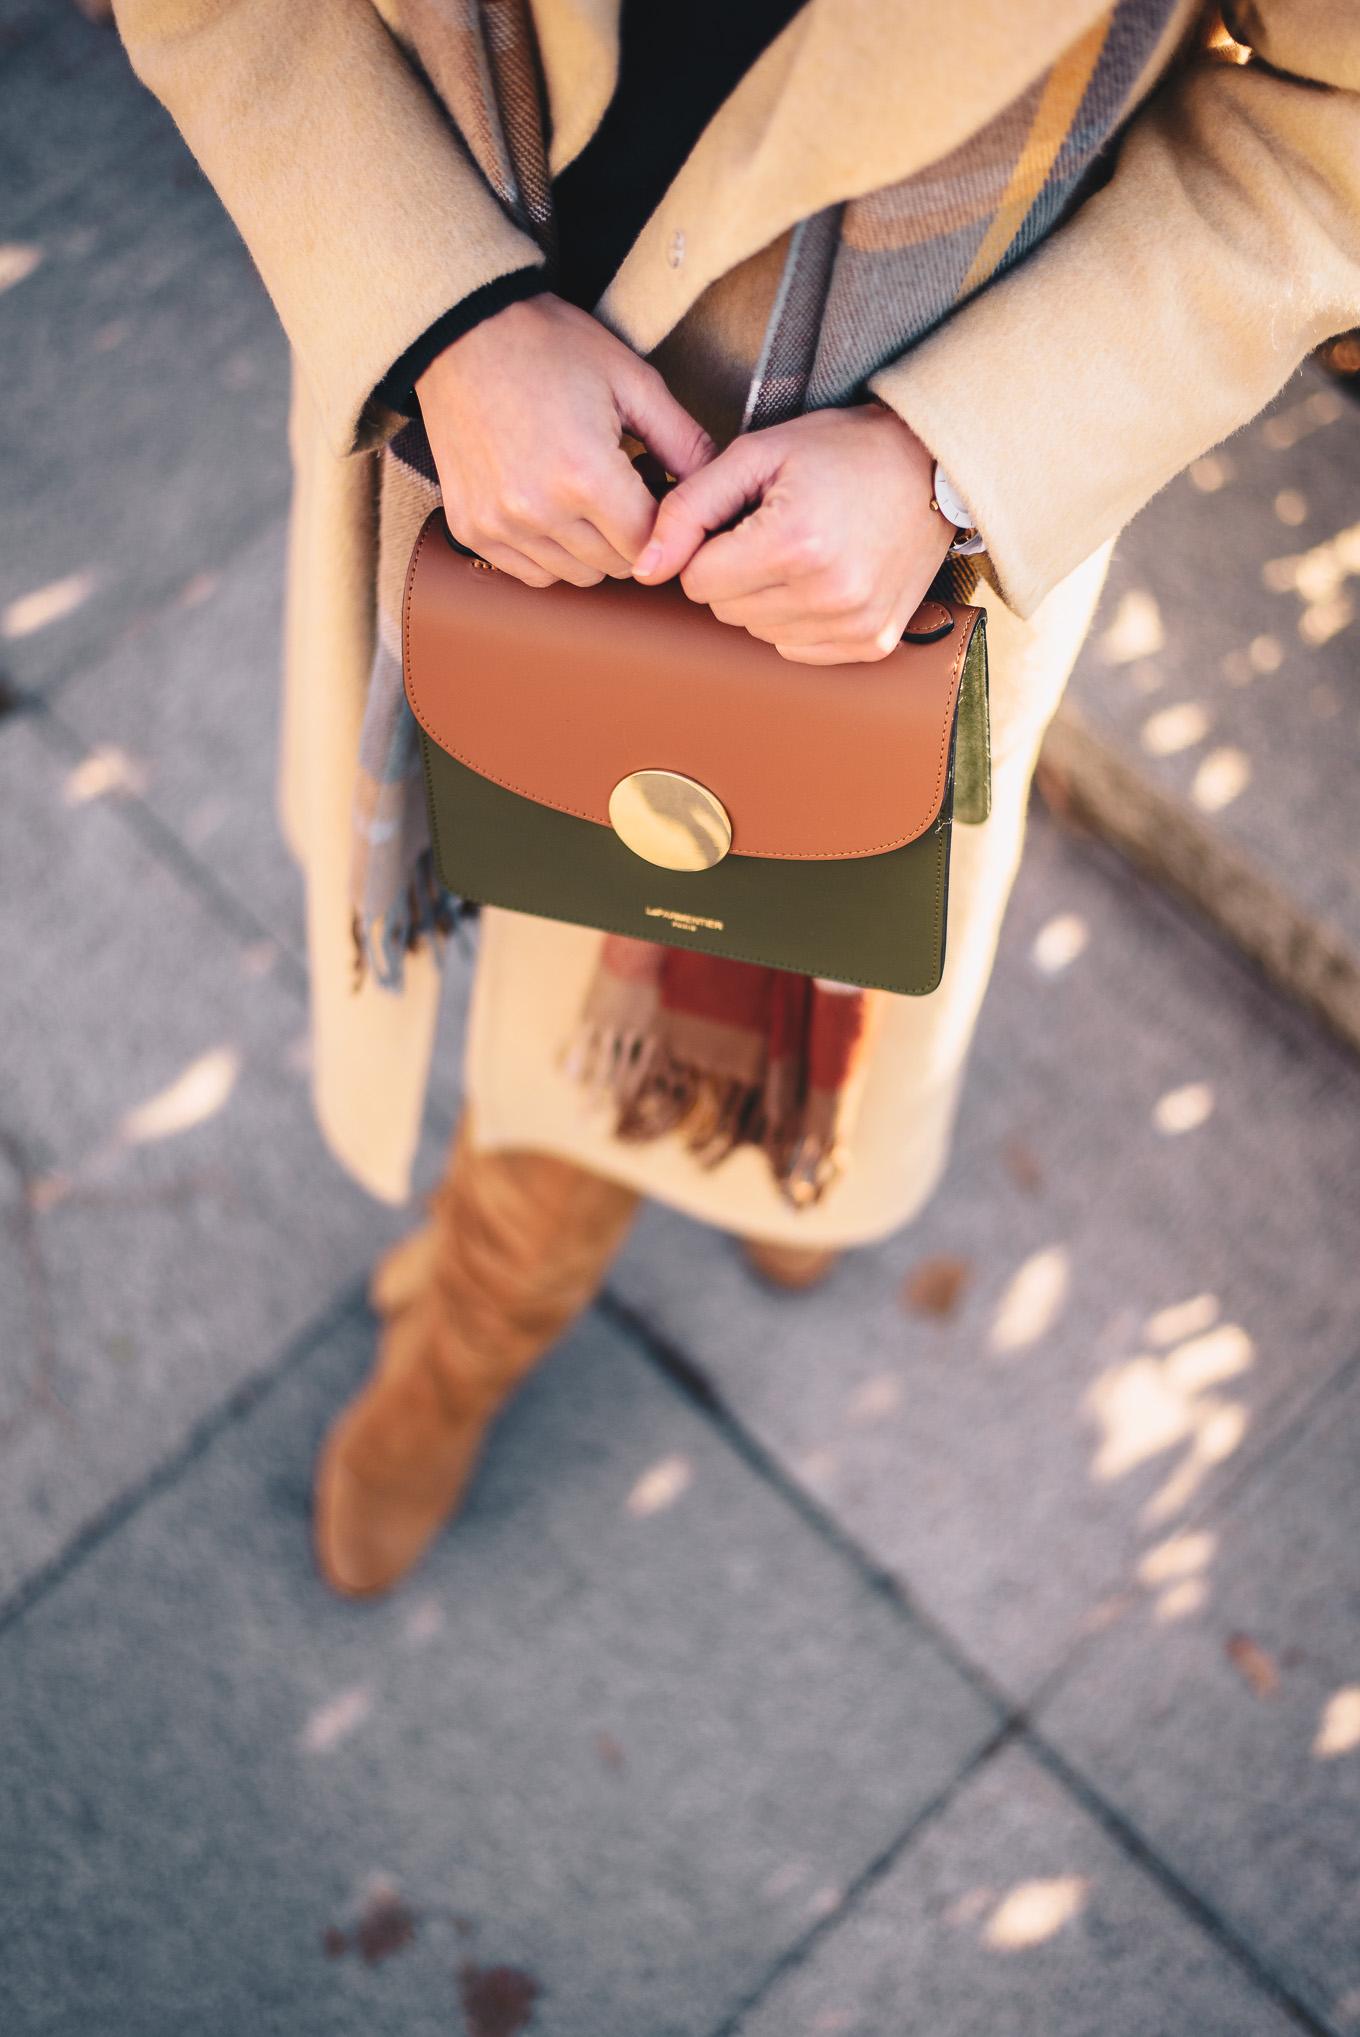 leparmentier paris handbag